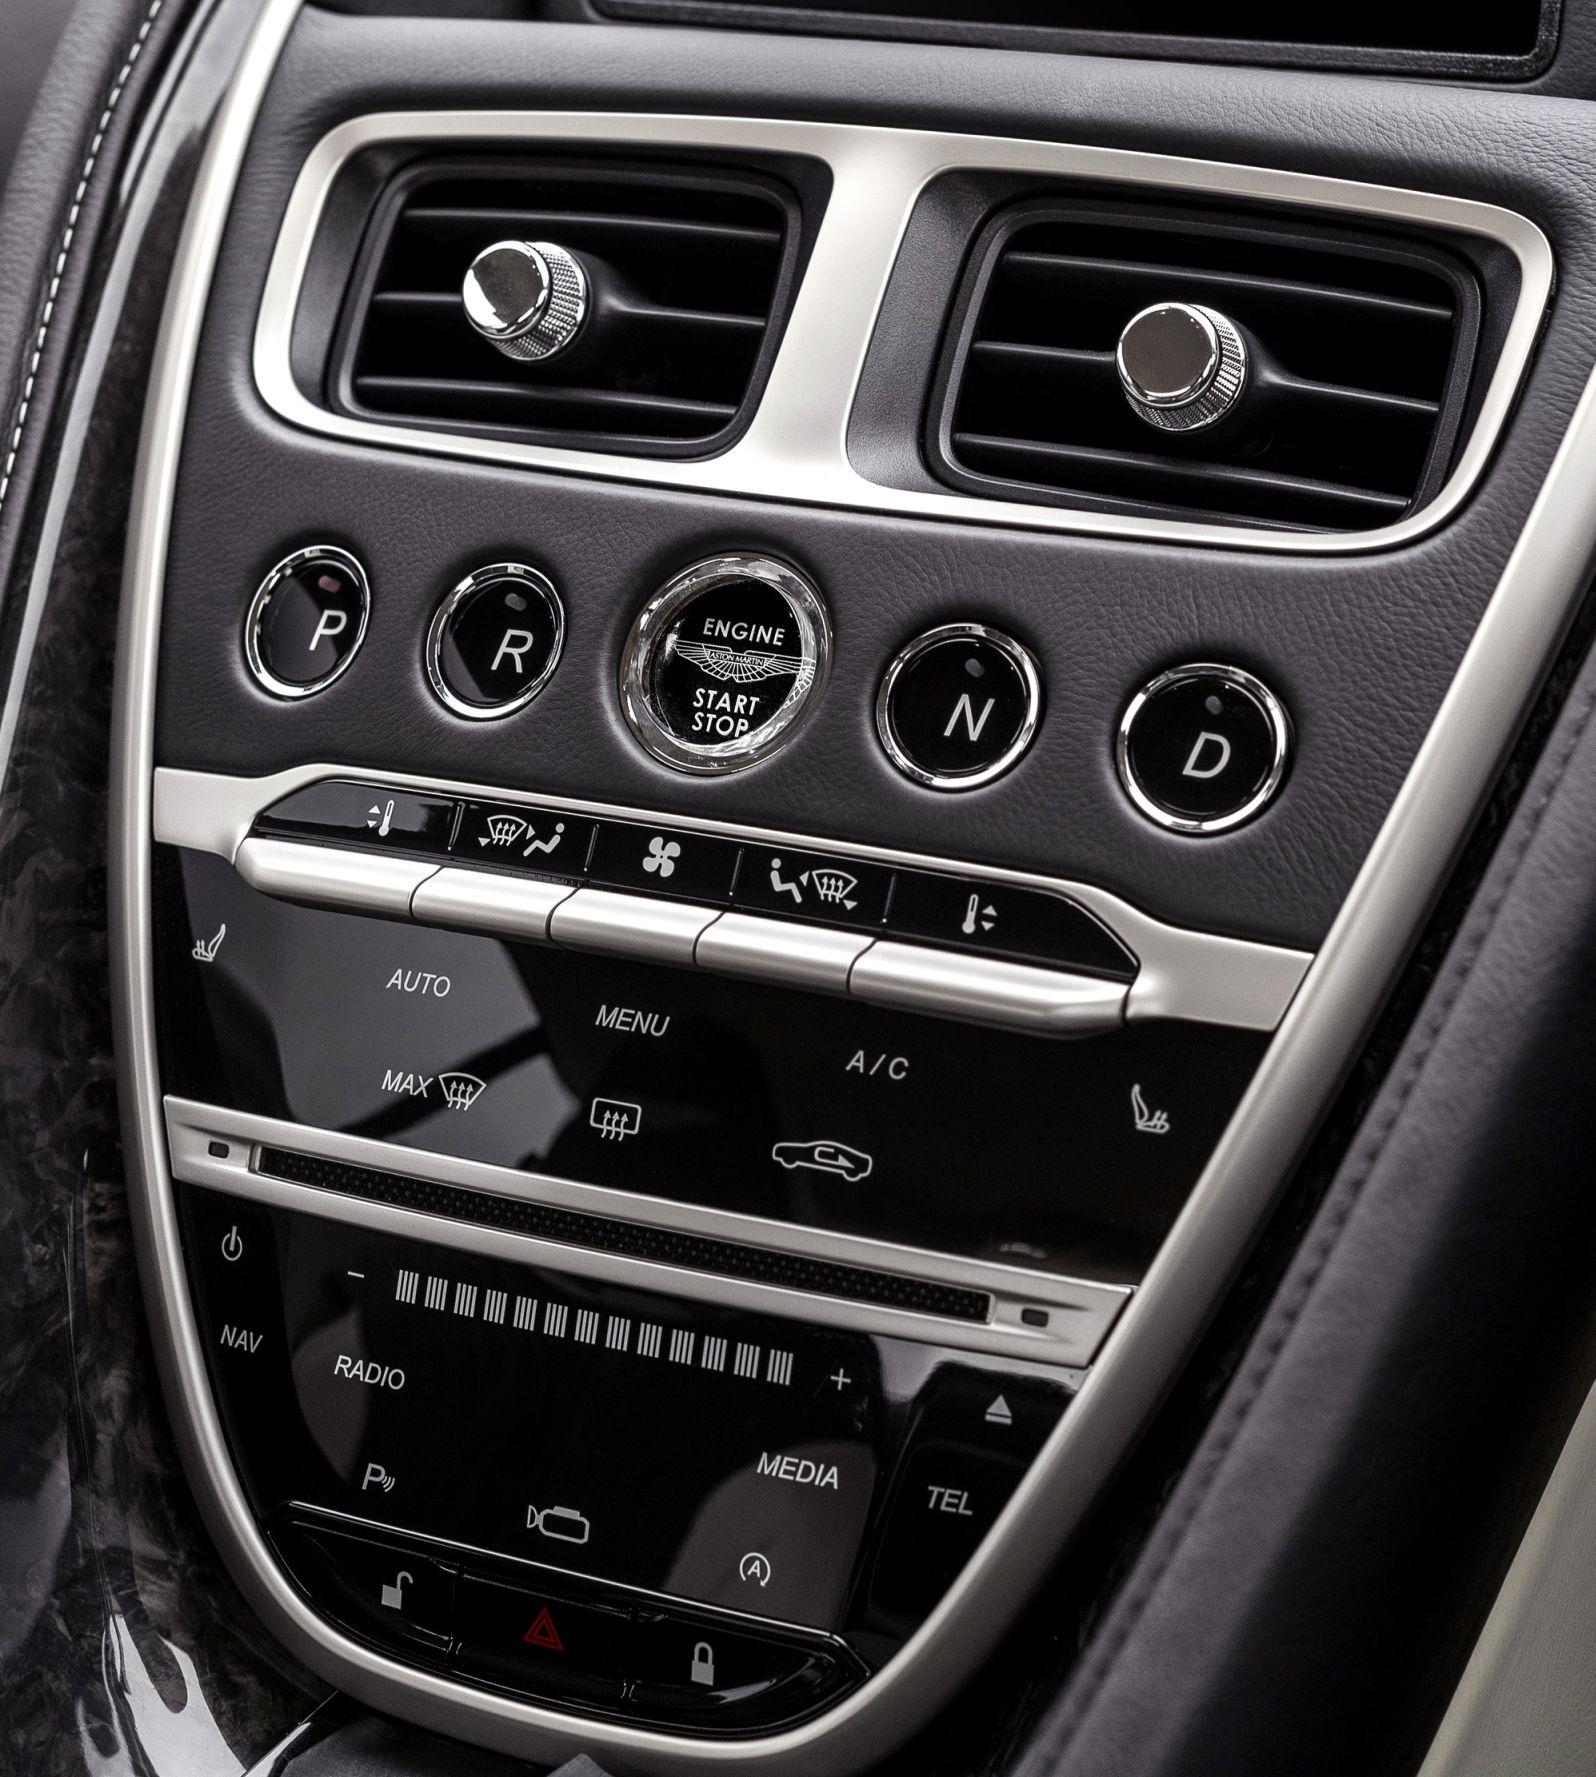 Control element in the centre console